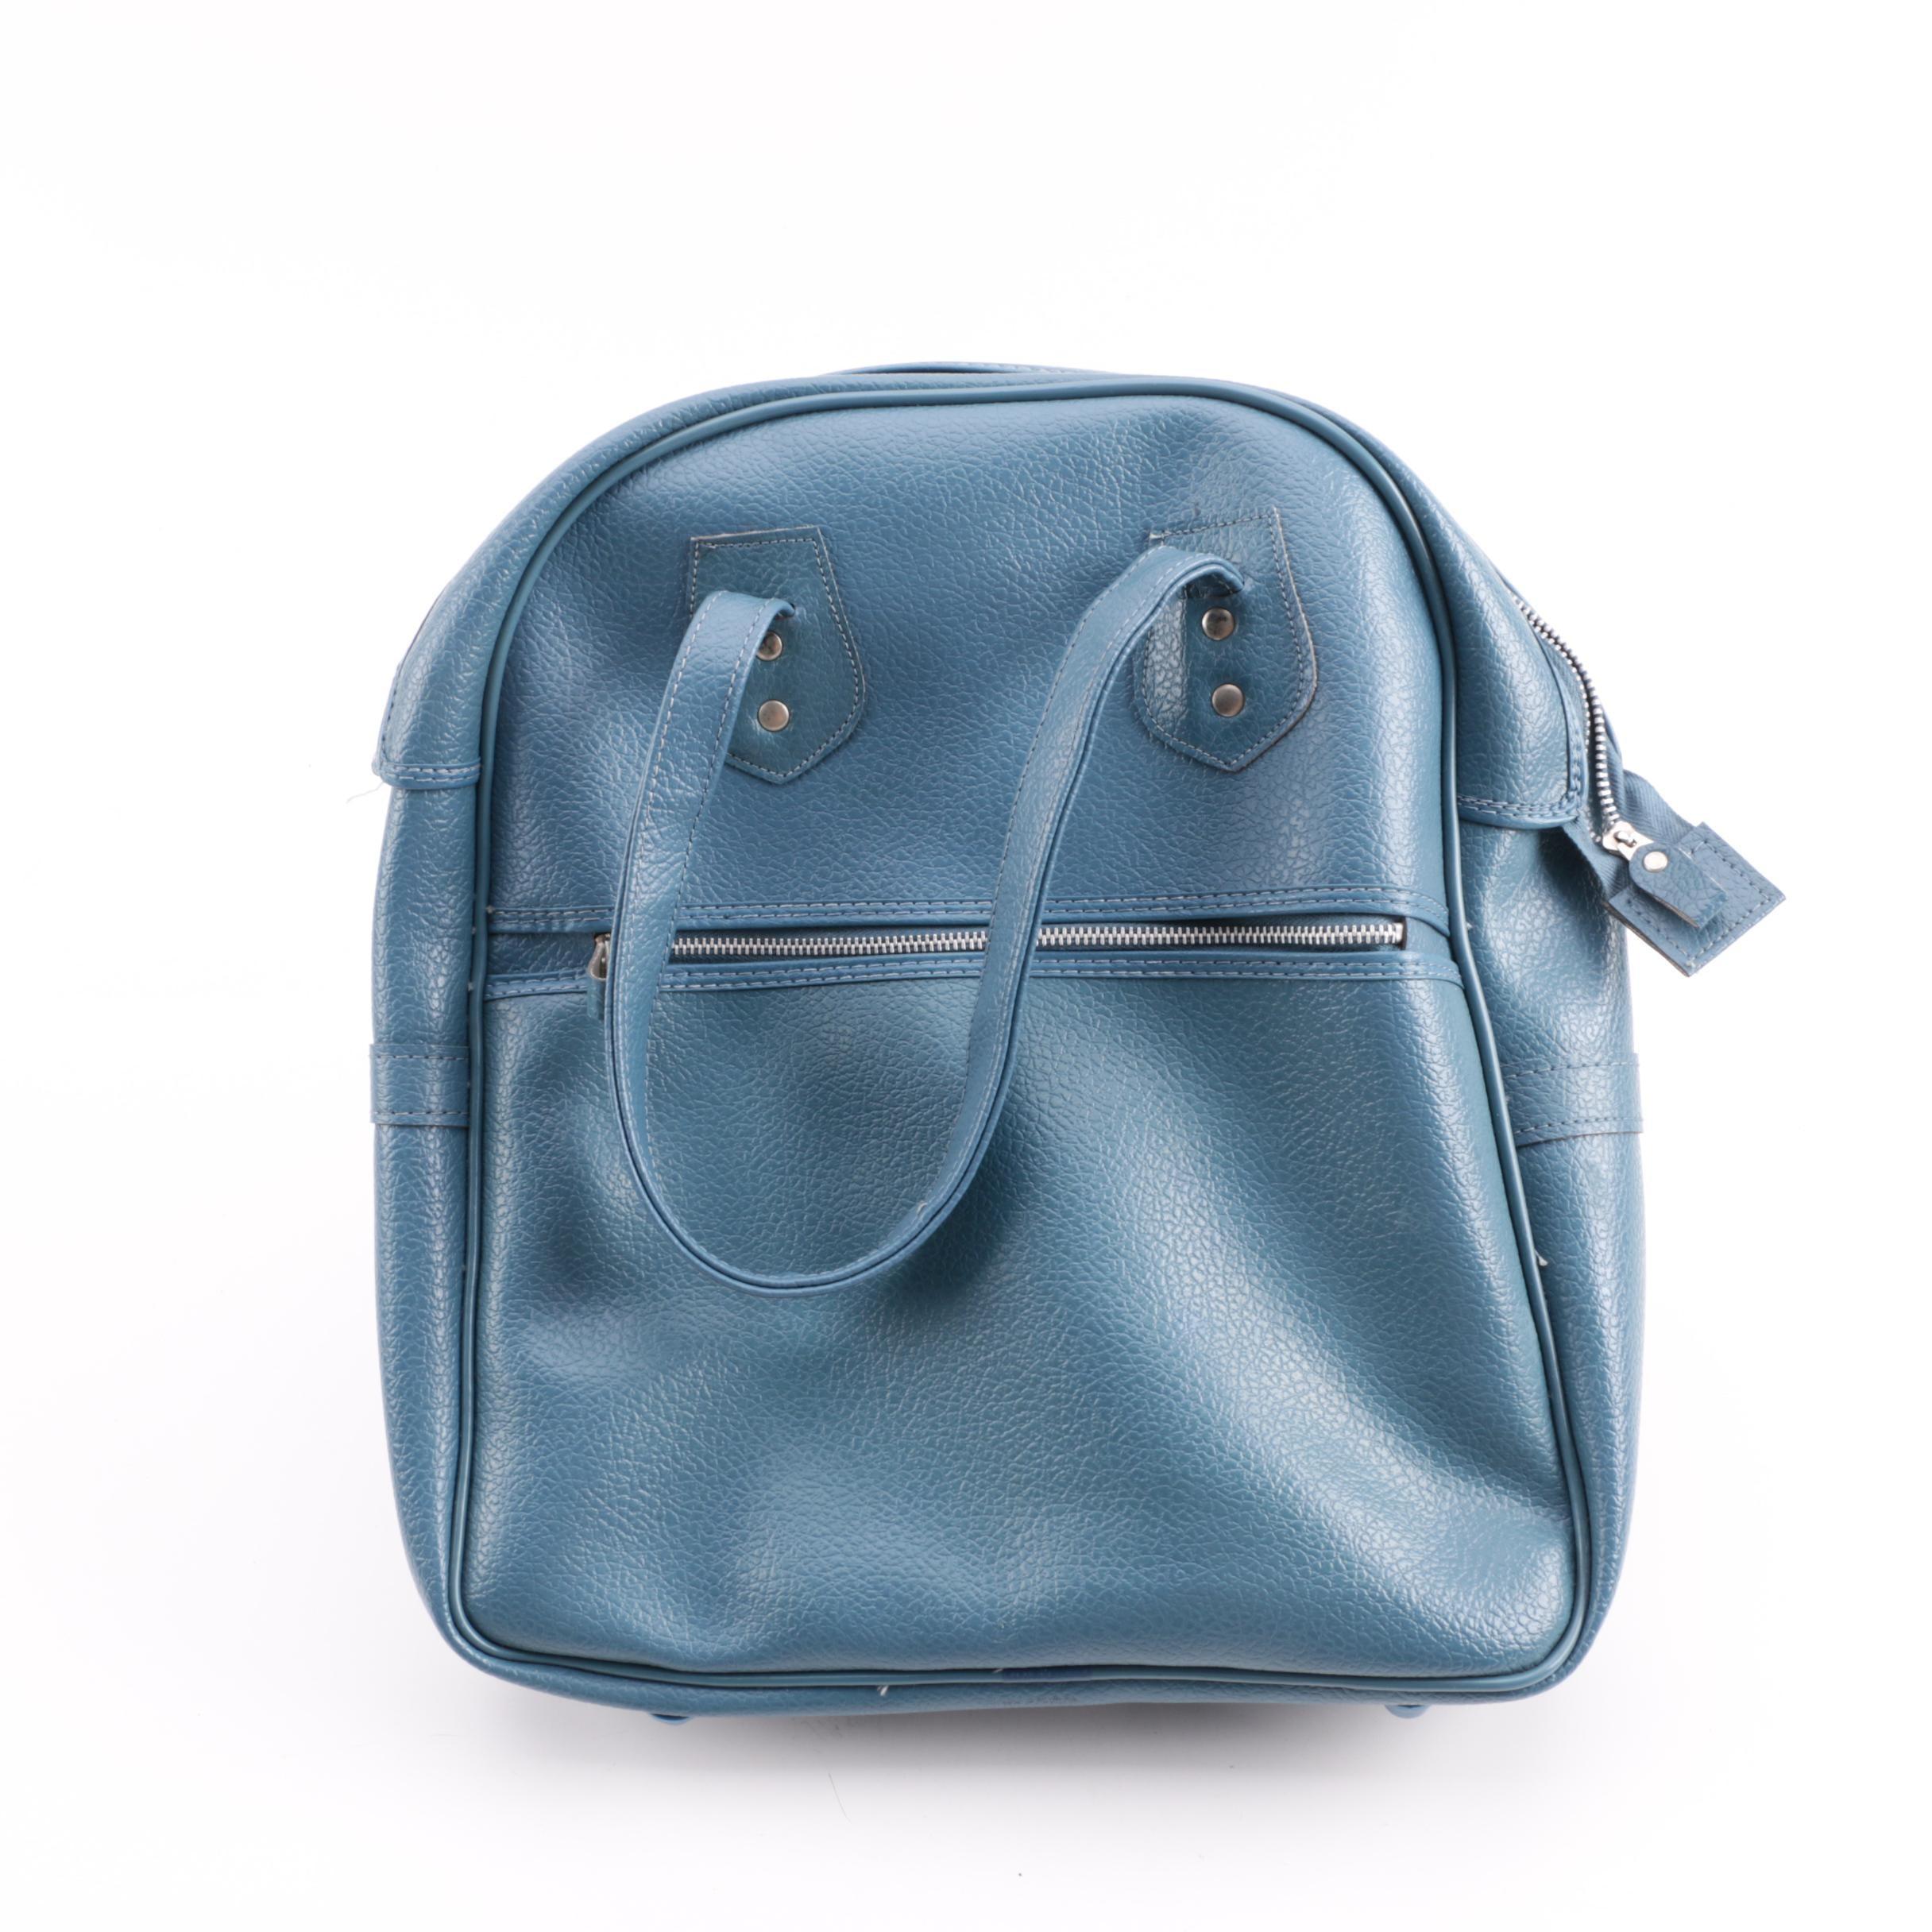 Vintage Blue Faux Pebbled Leather Carry-On Bag